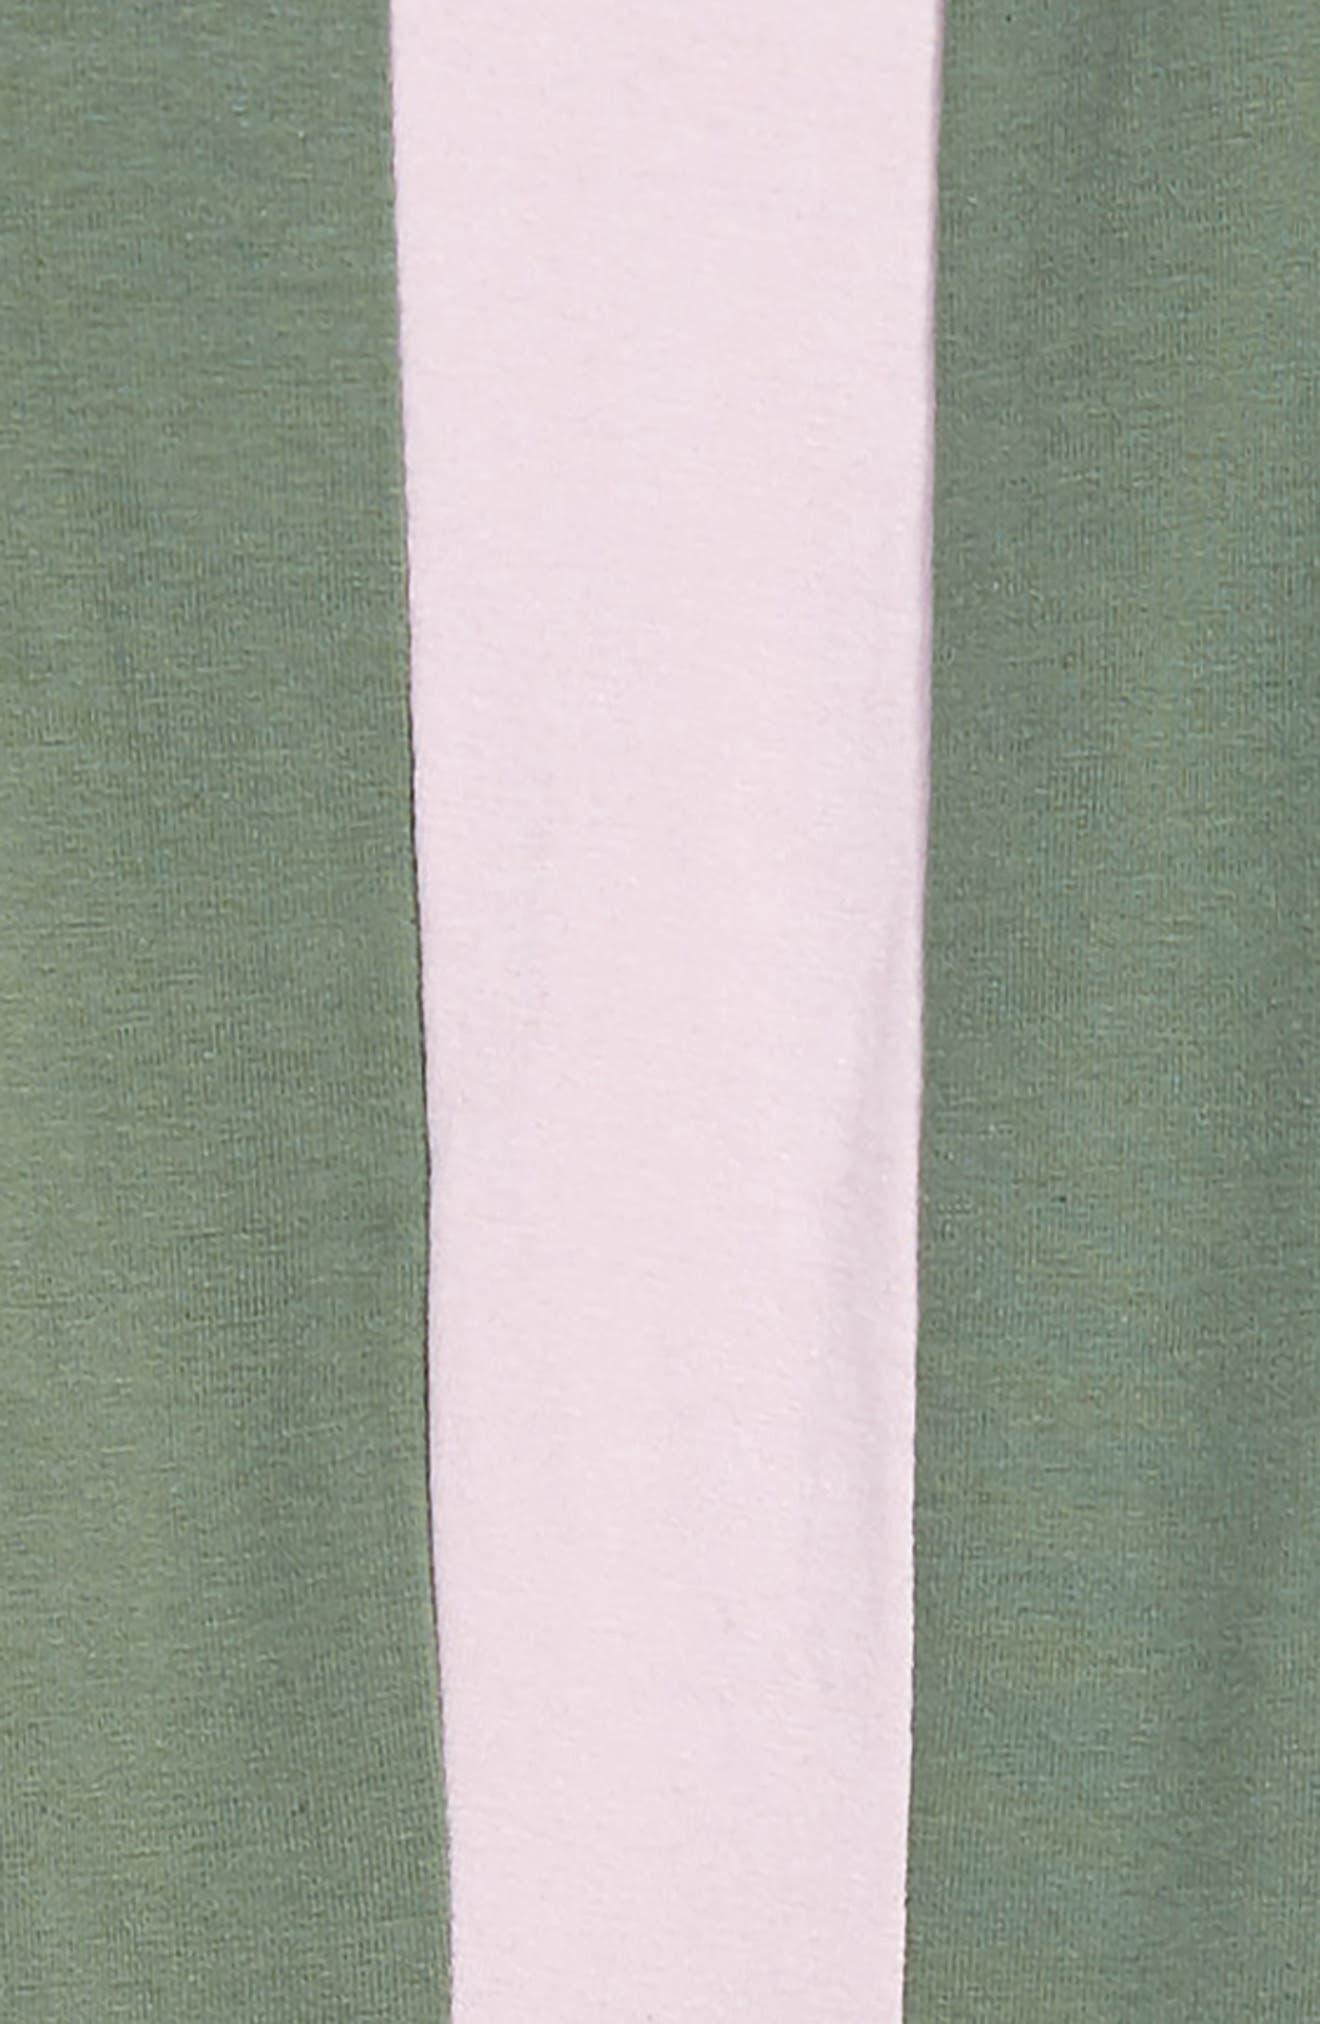 T7 Leggings,                             Alternate thumbnail 2, color,                             385